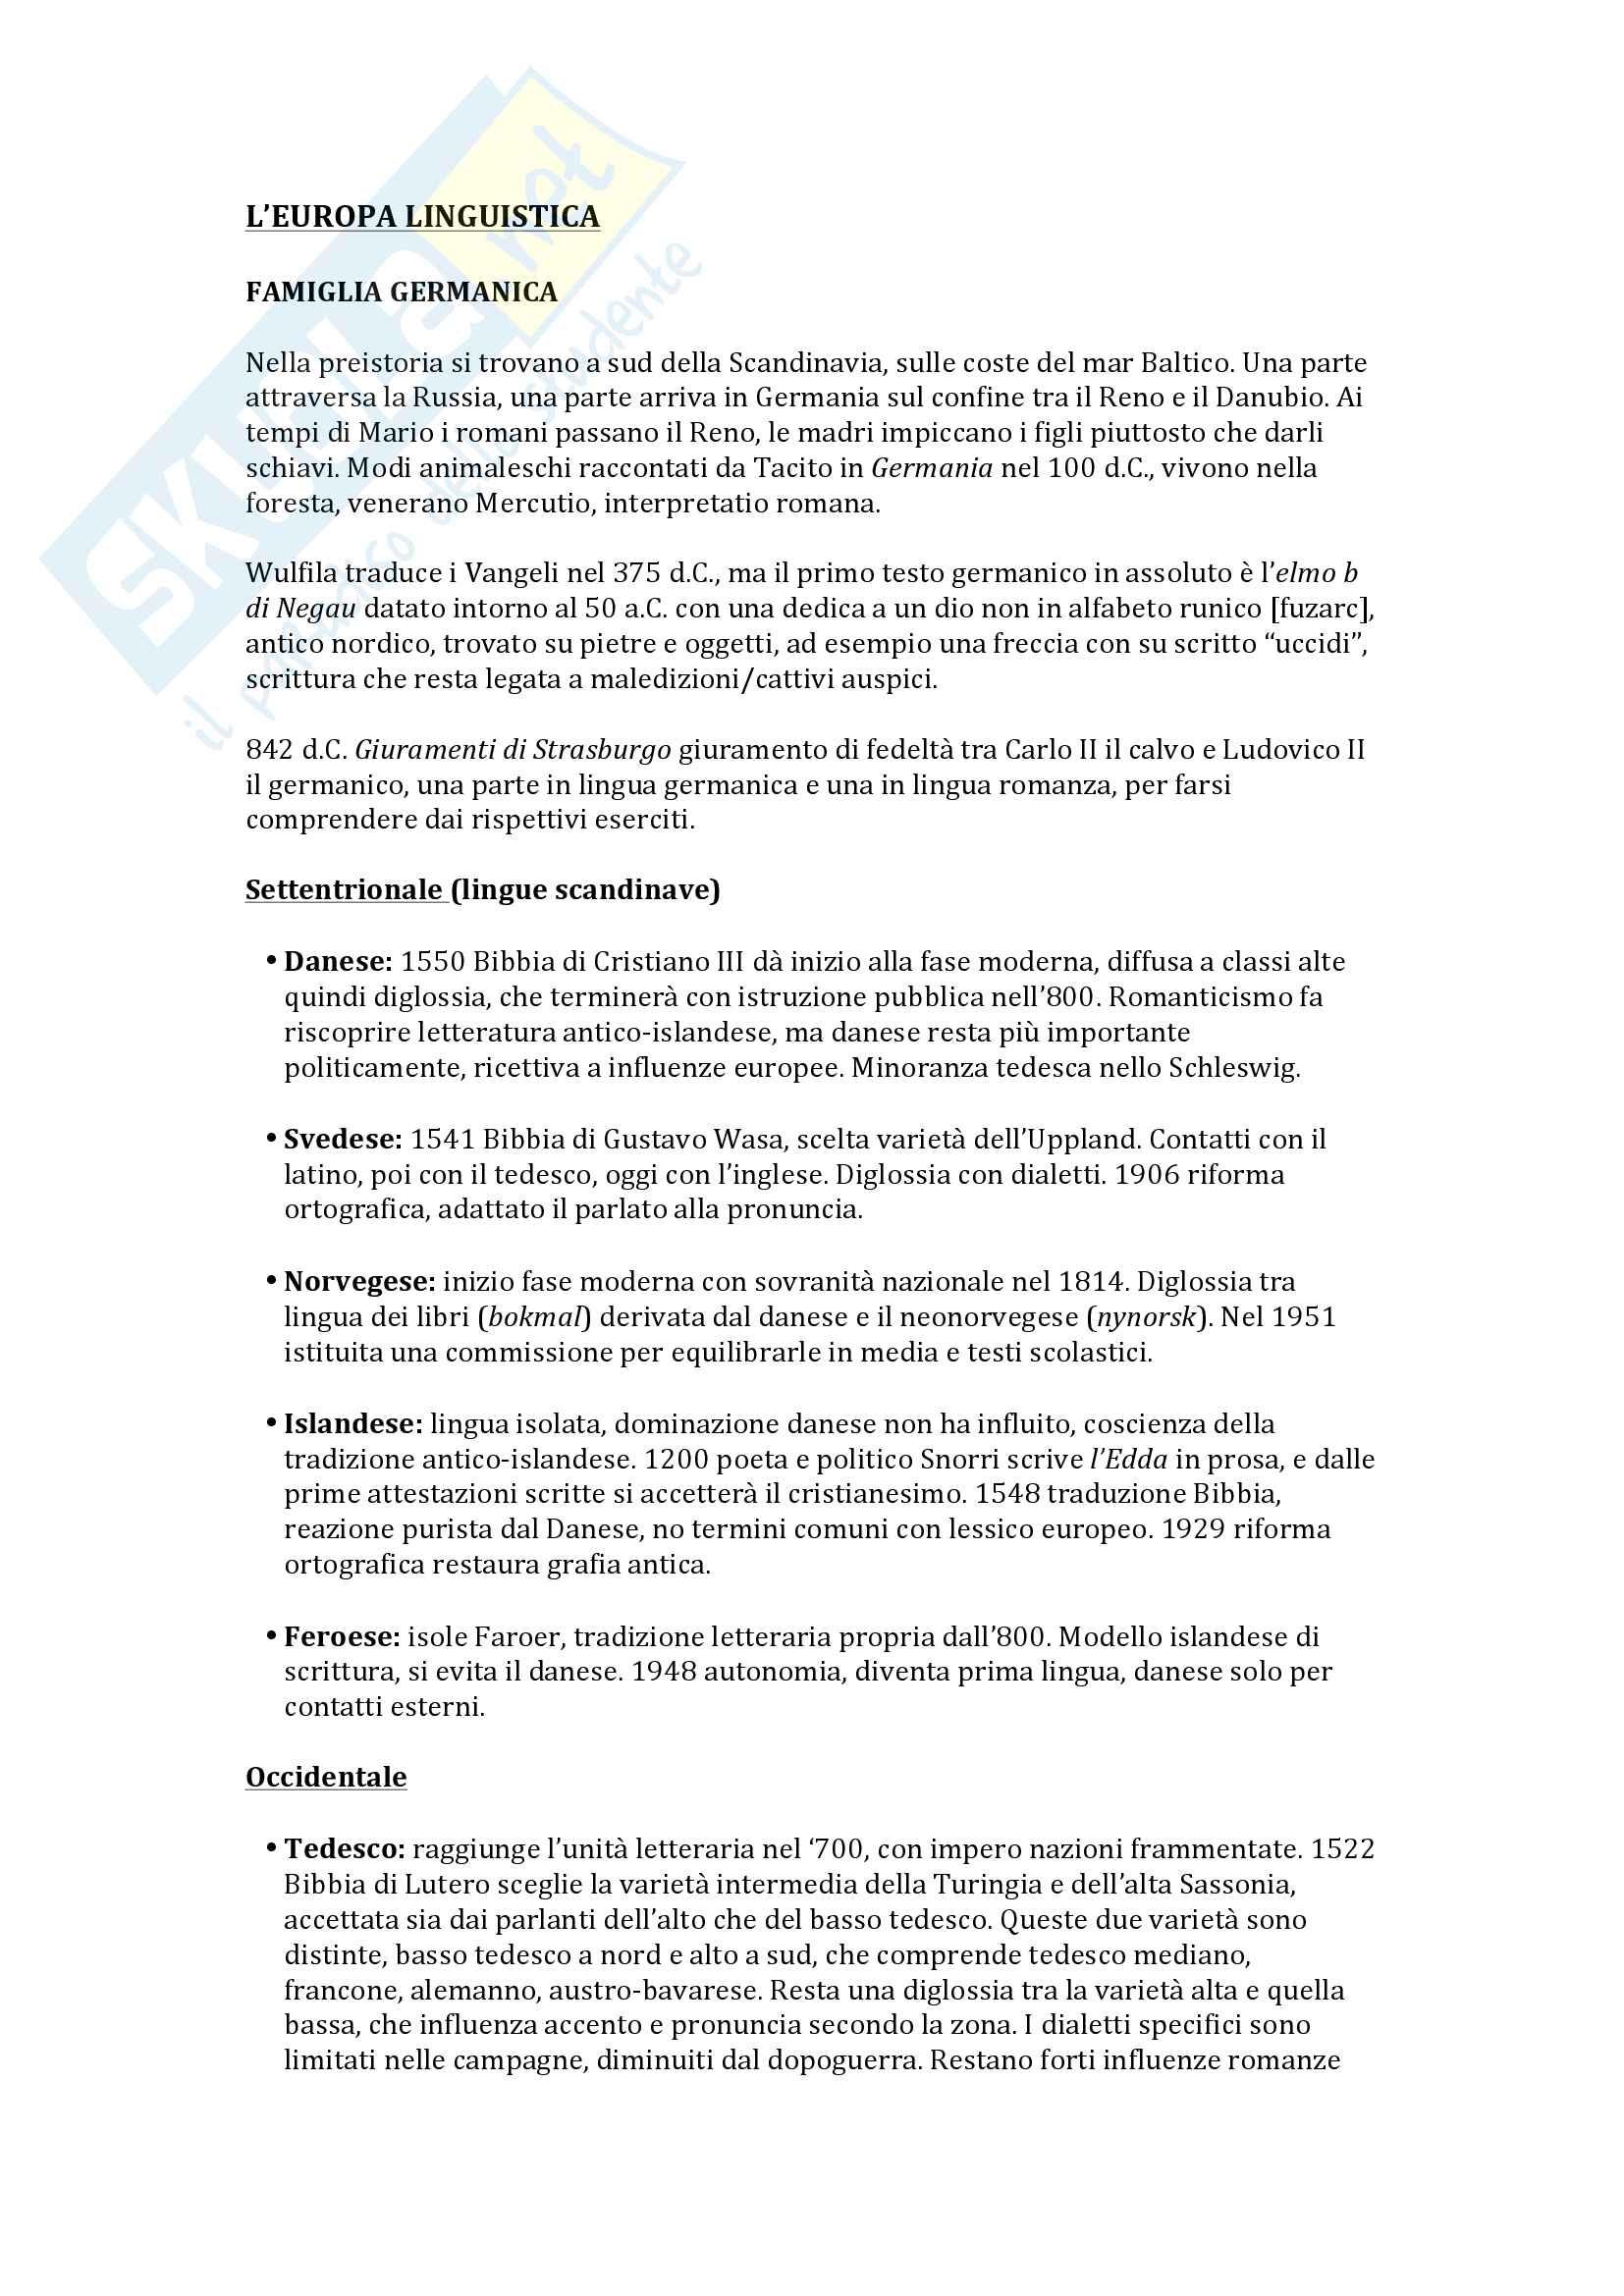 Appunti Europa Linguistica, docente Caprini